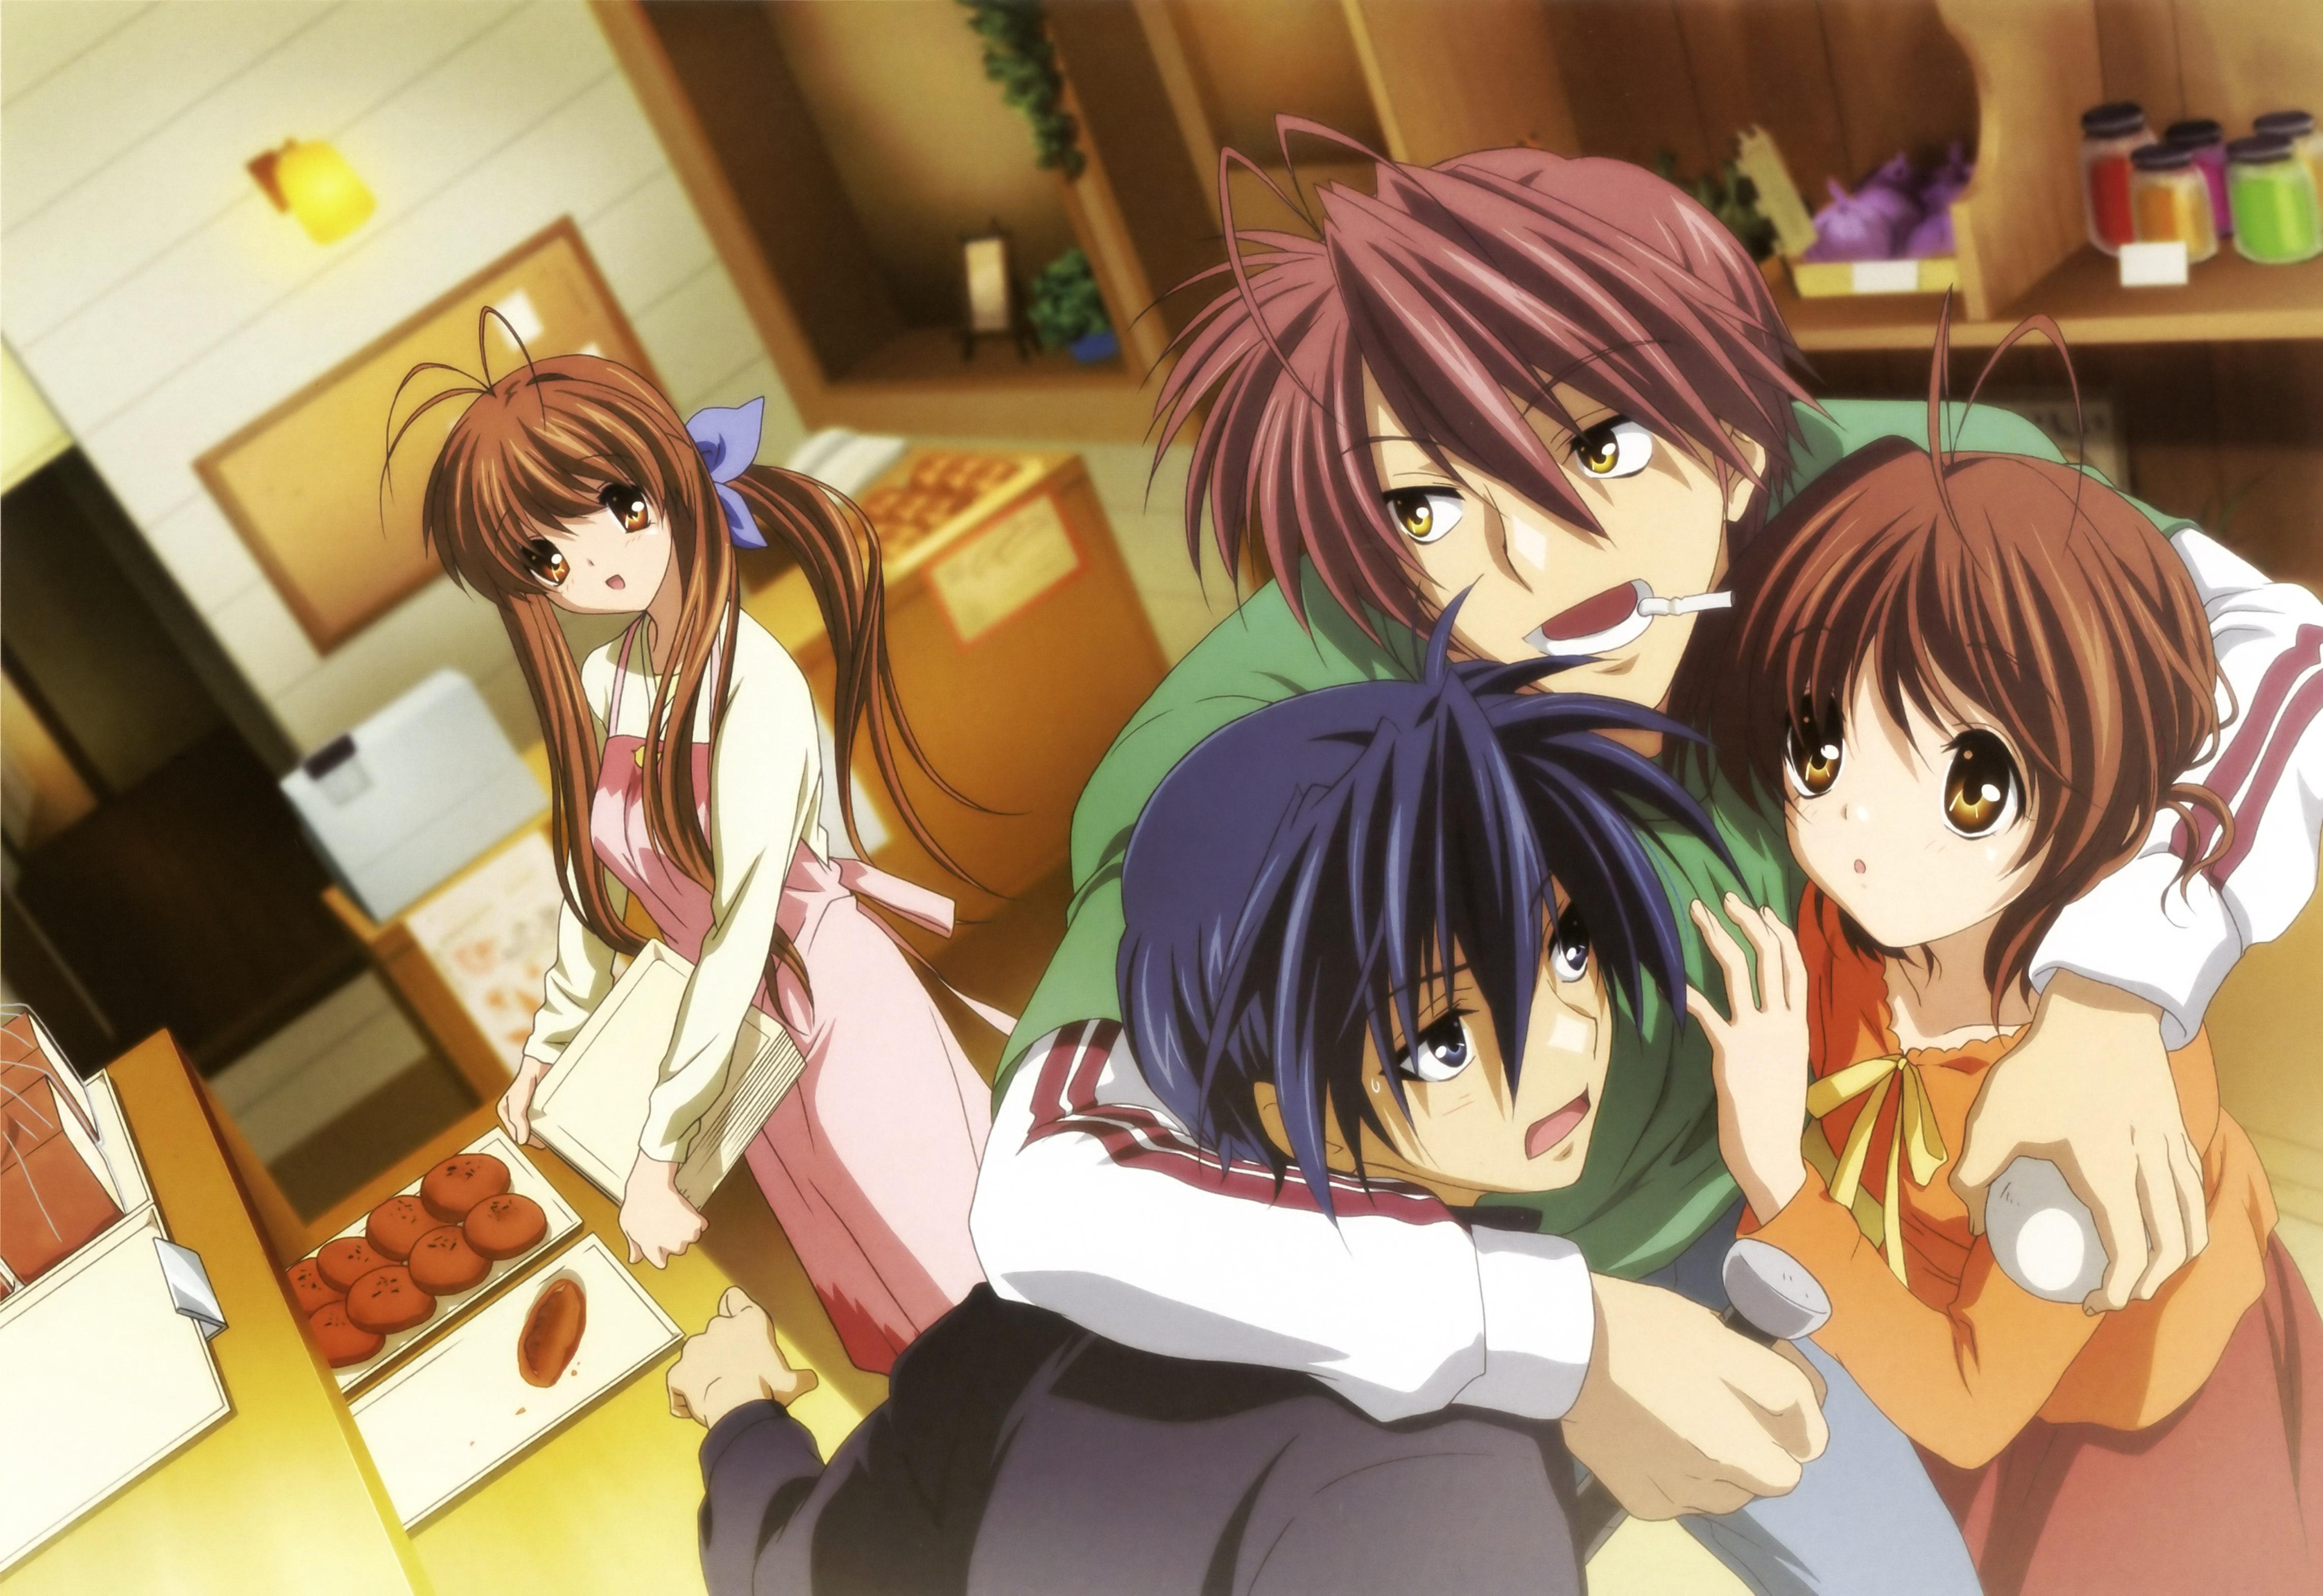 CLANNAD | page 2 of 81 - Zerochan Anime Image Board